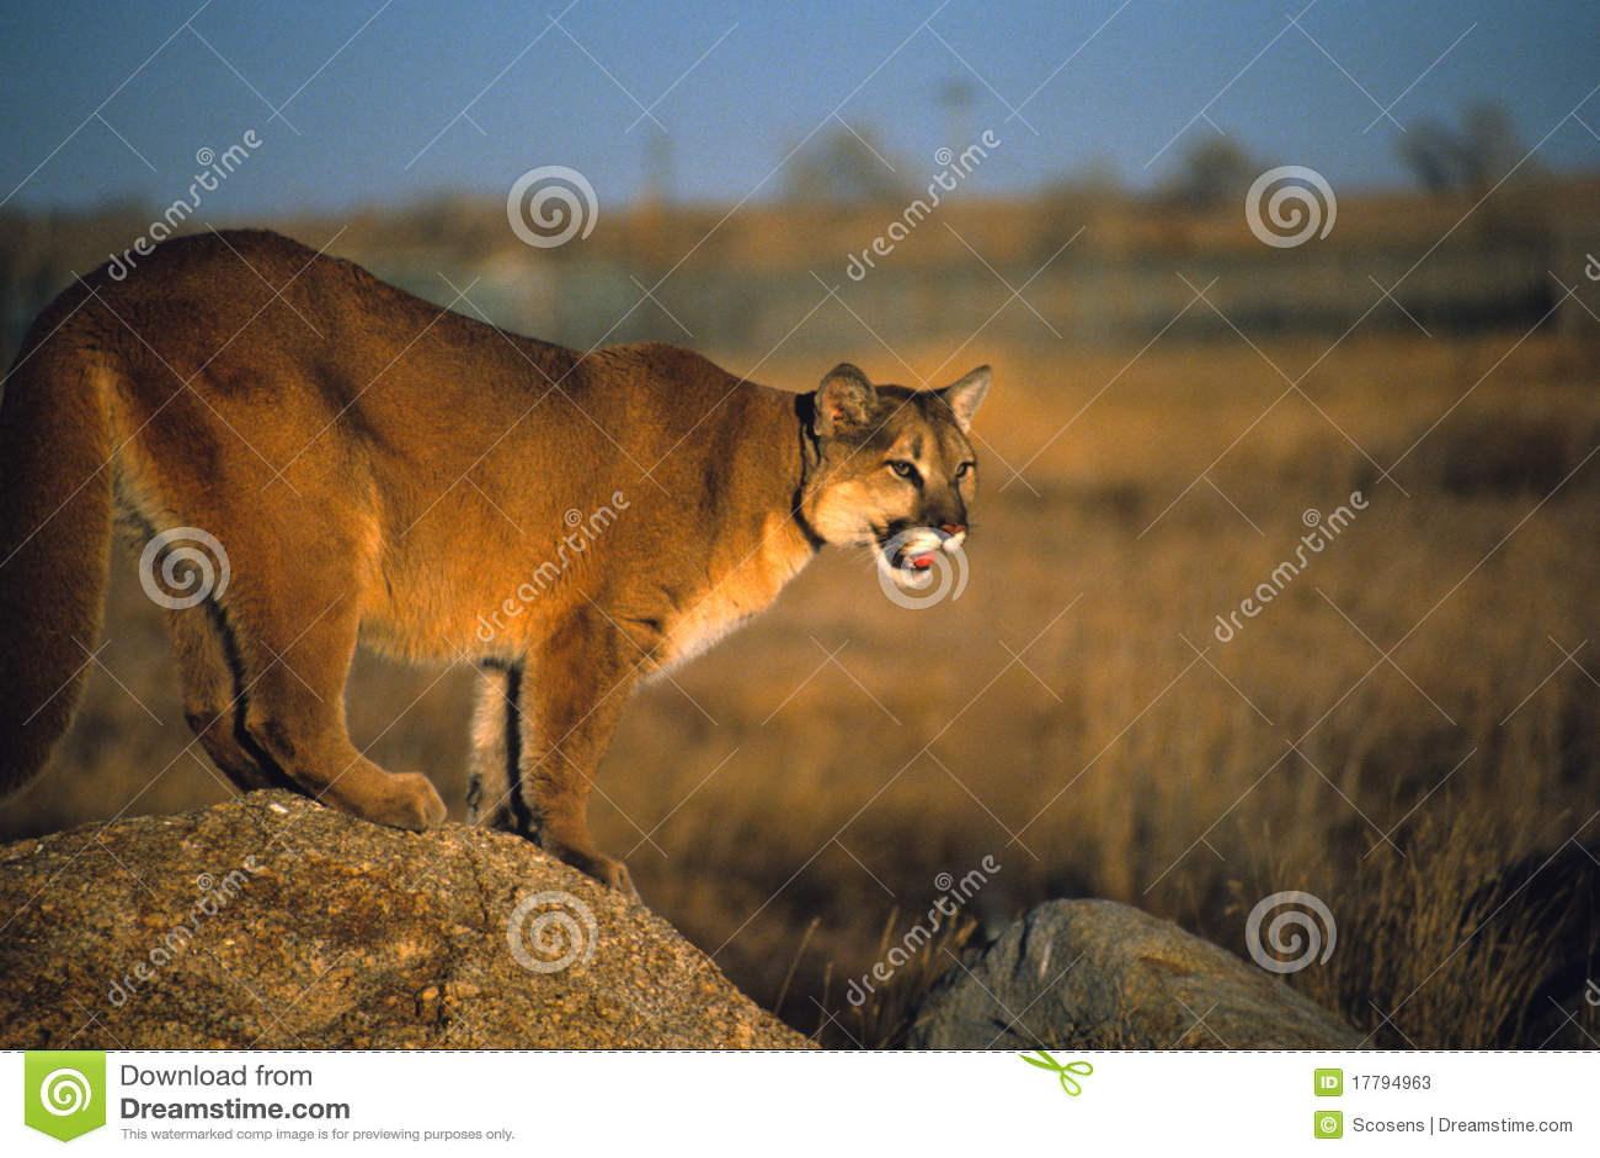 Mountain lion on rock stock image. Image of mountain ...